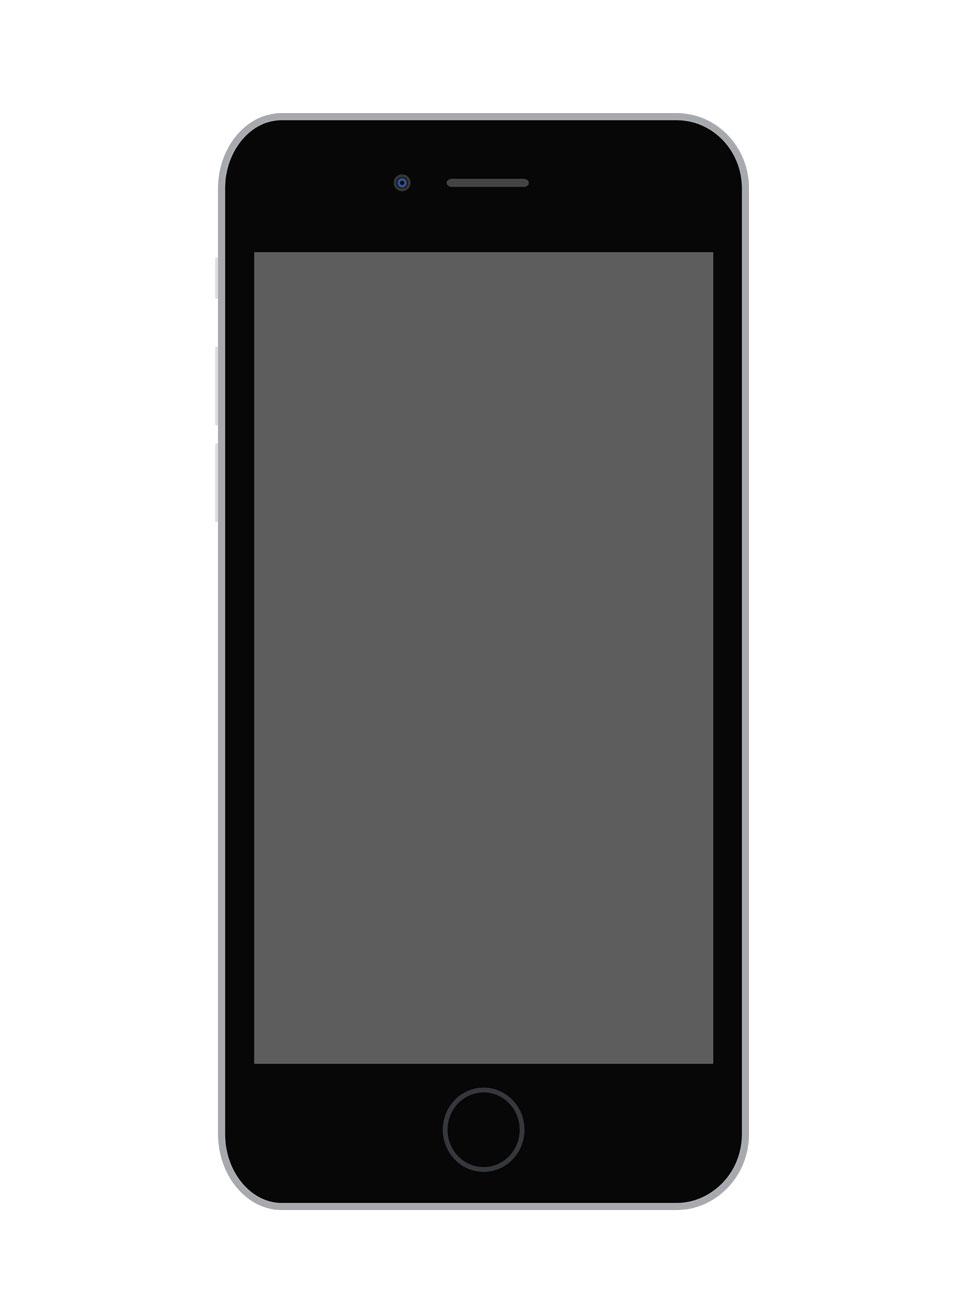 Flat iPhone 6 vector + iPhone sketch Mockup